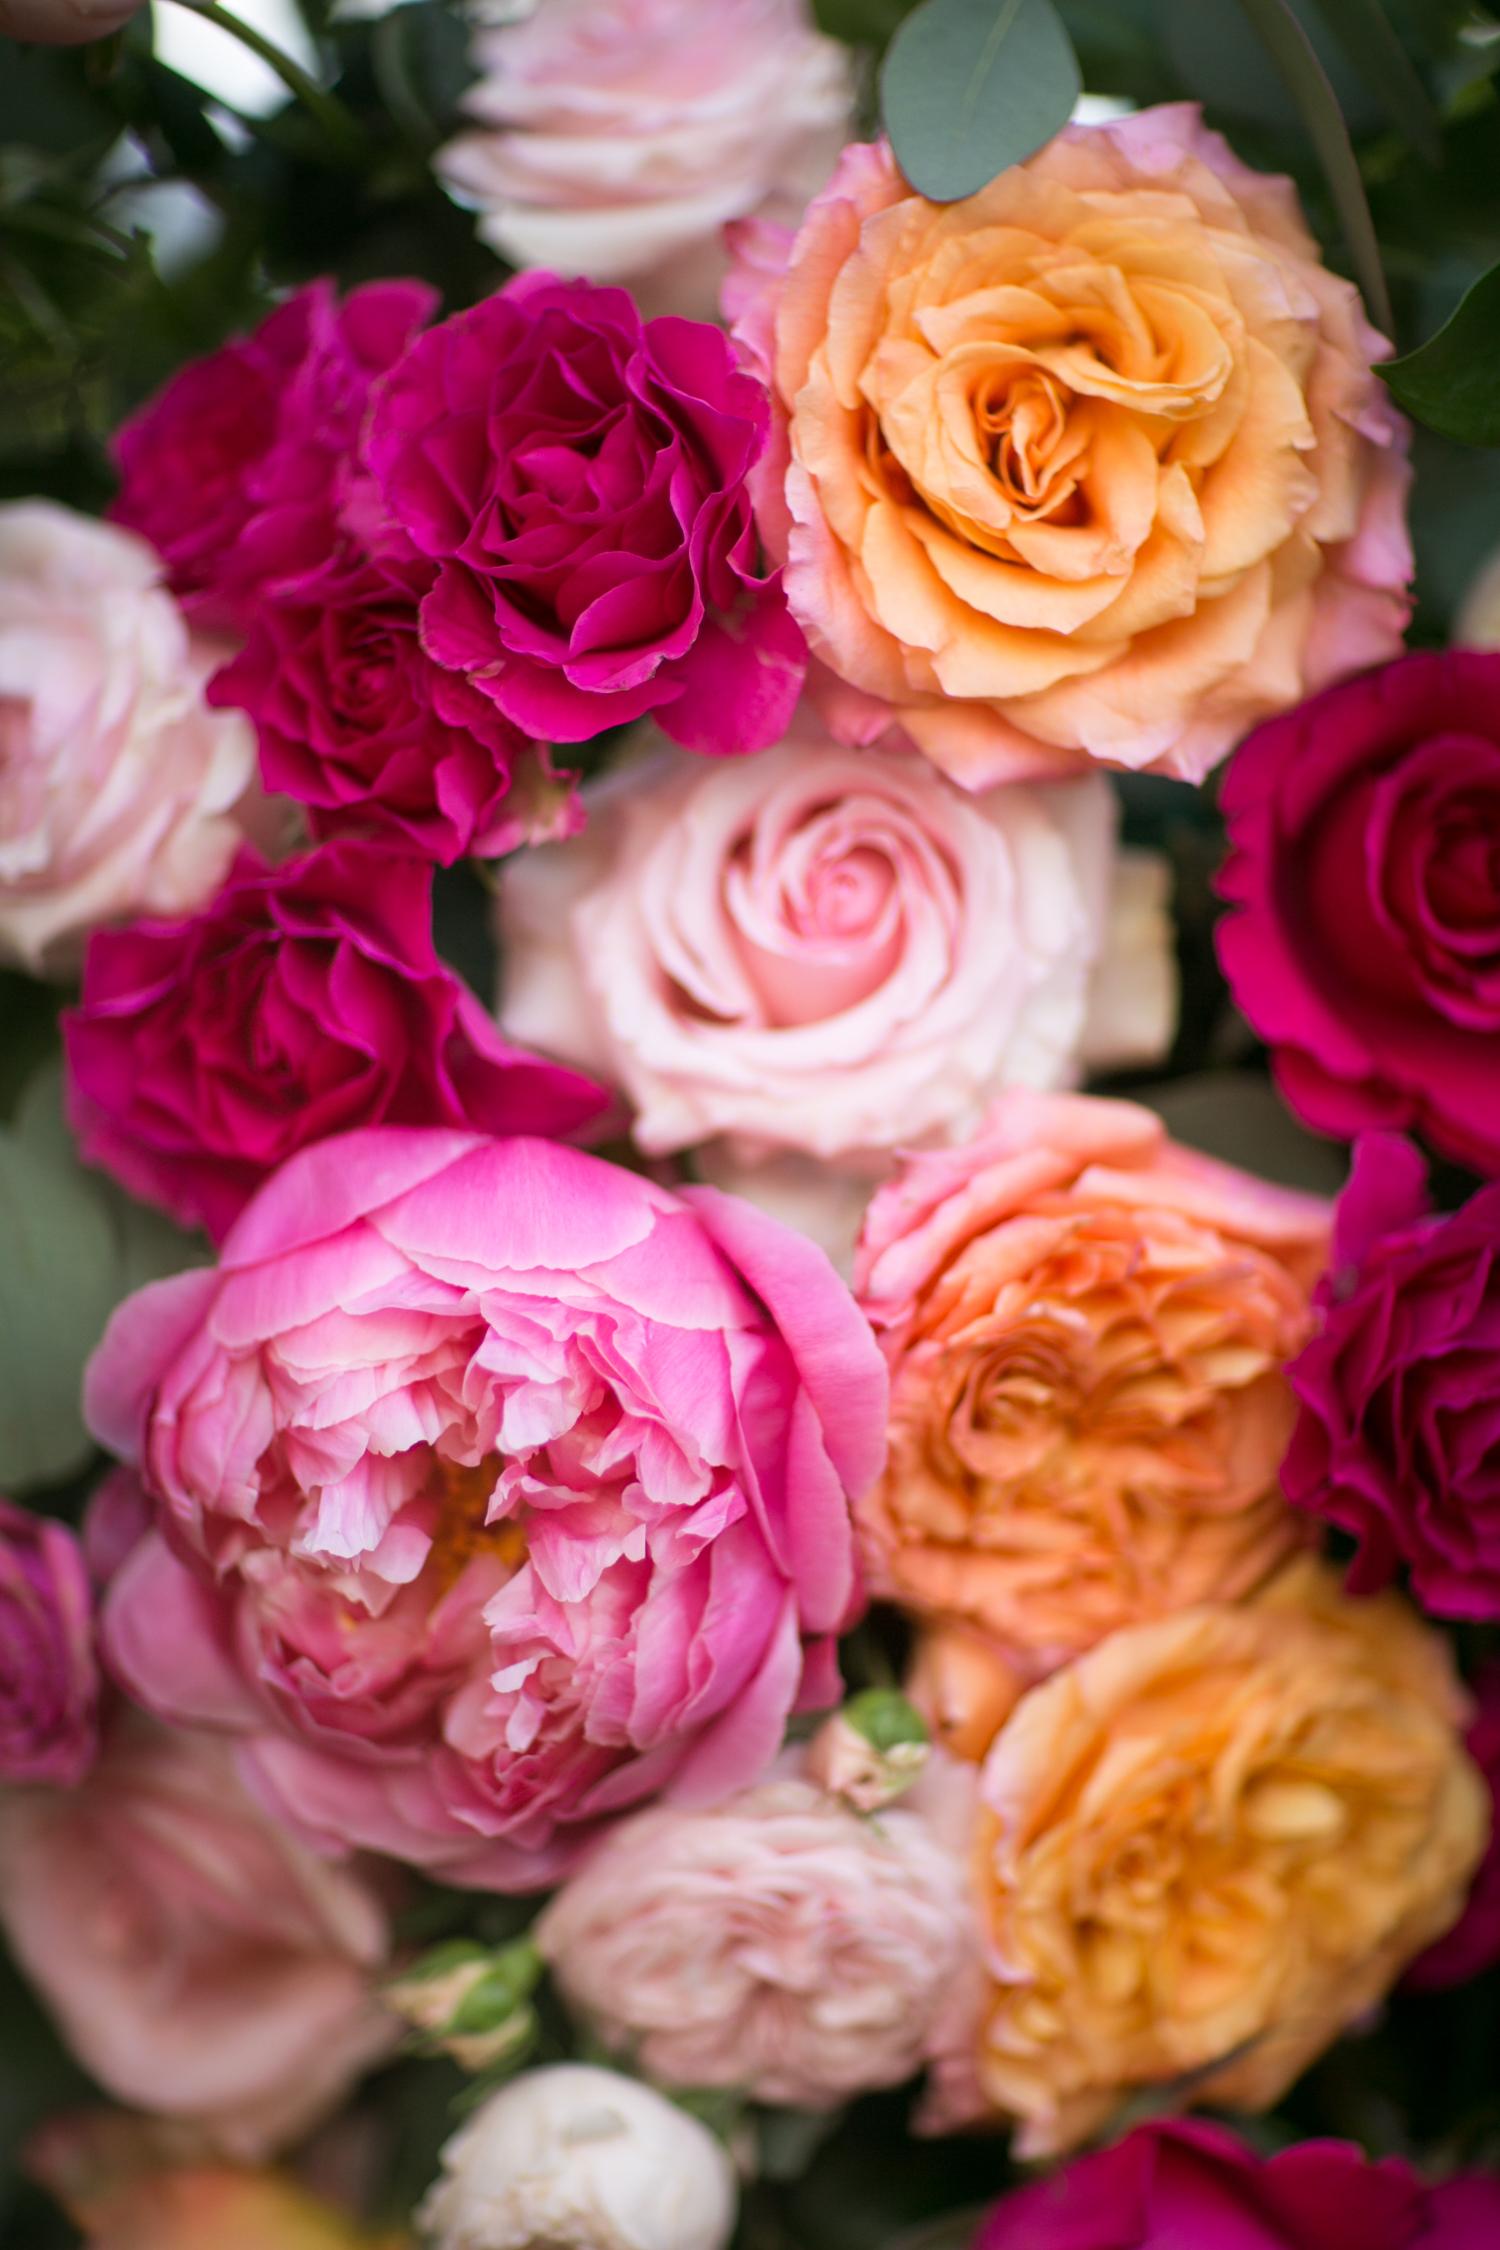 www.santabarbarawedding.com | Miki & Sonja Photography | Four Seasons Resort The Biltmore | Imagine Weddings & Special Events | Rockrose Floral Design | Flower Bouquet